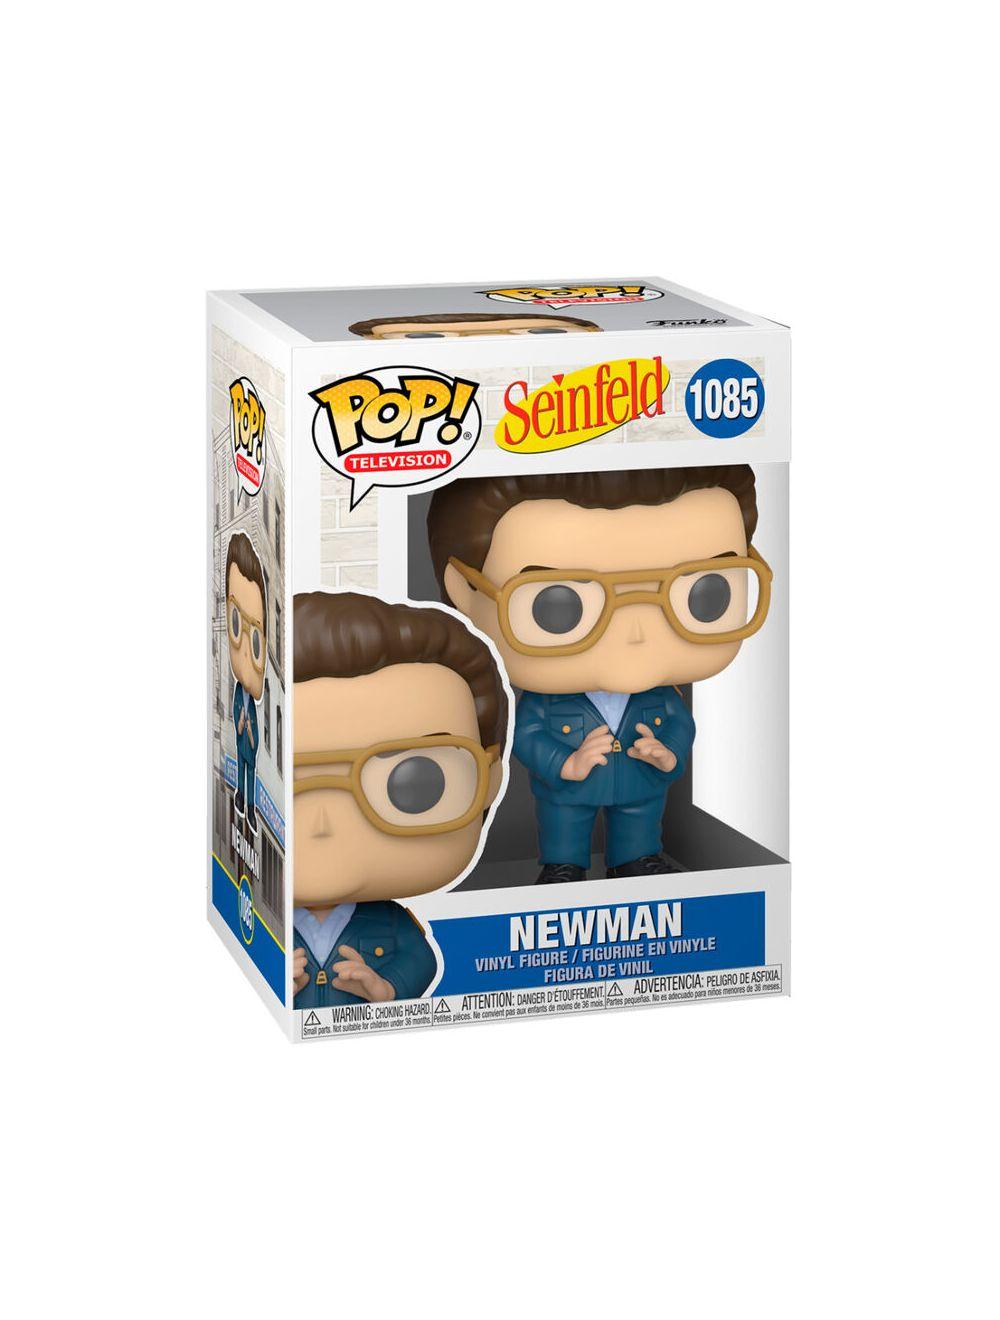 Funko POP! Seinfeld - Newman the Mailman Vinyl Figura 10cm